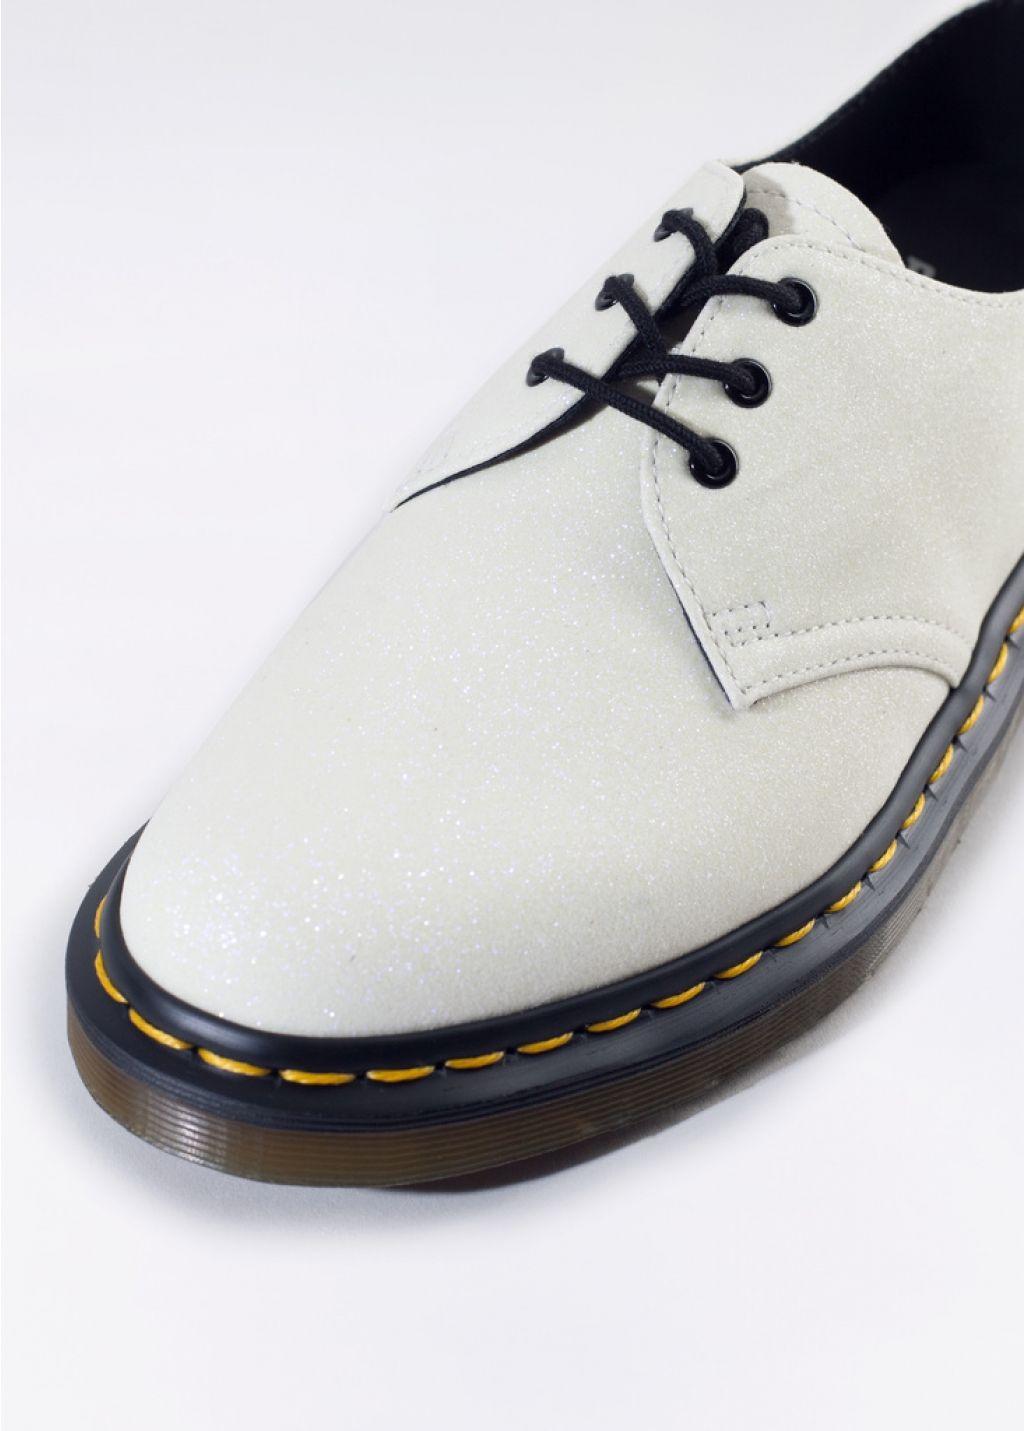 Dr.Martens - 1461 Glitter Shoe - $110.00